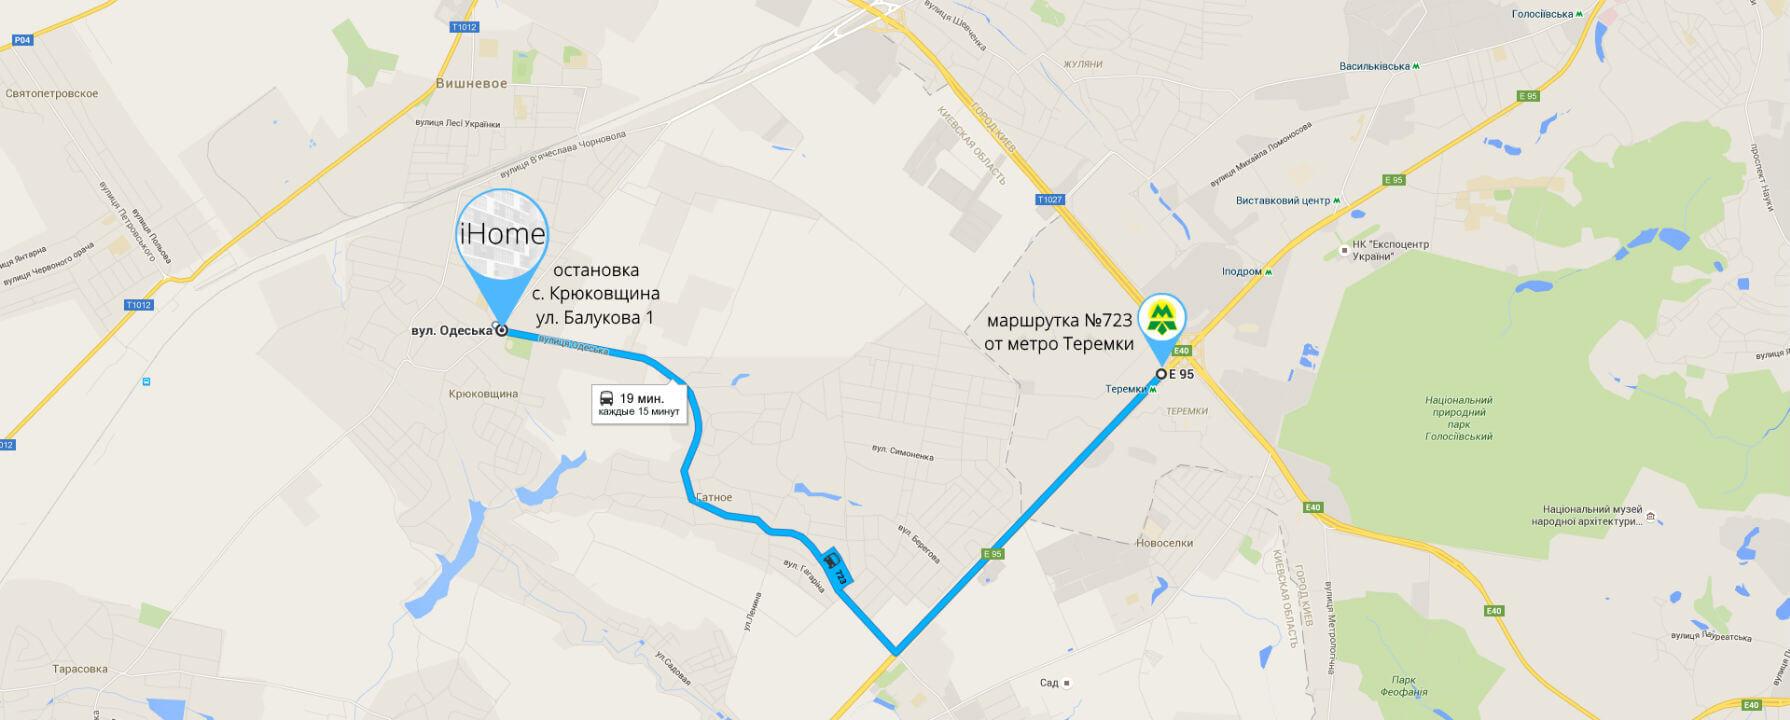 kak-dobratsya-ot-metro-teremki